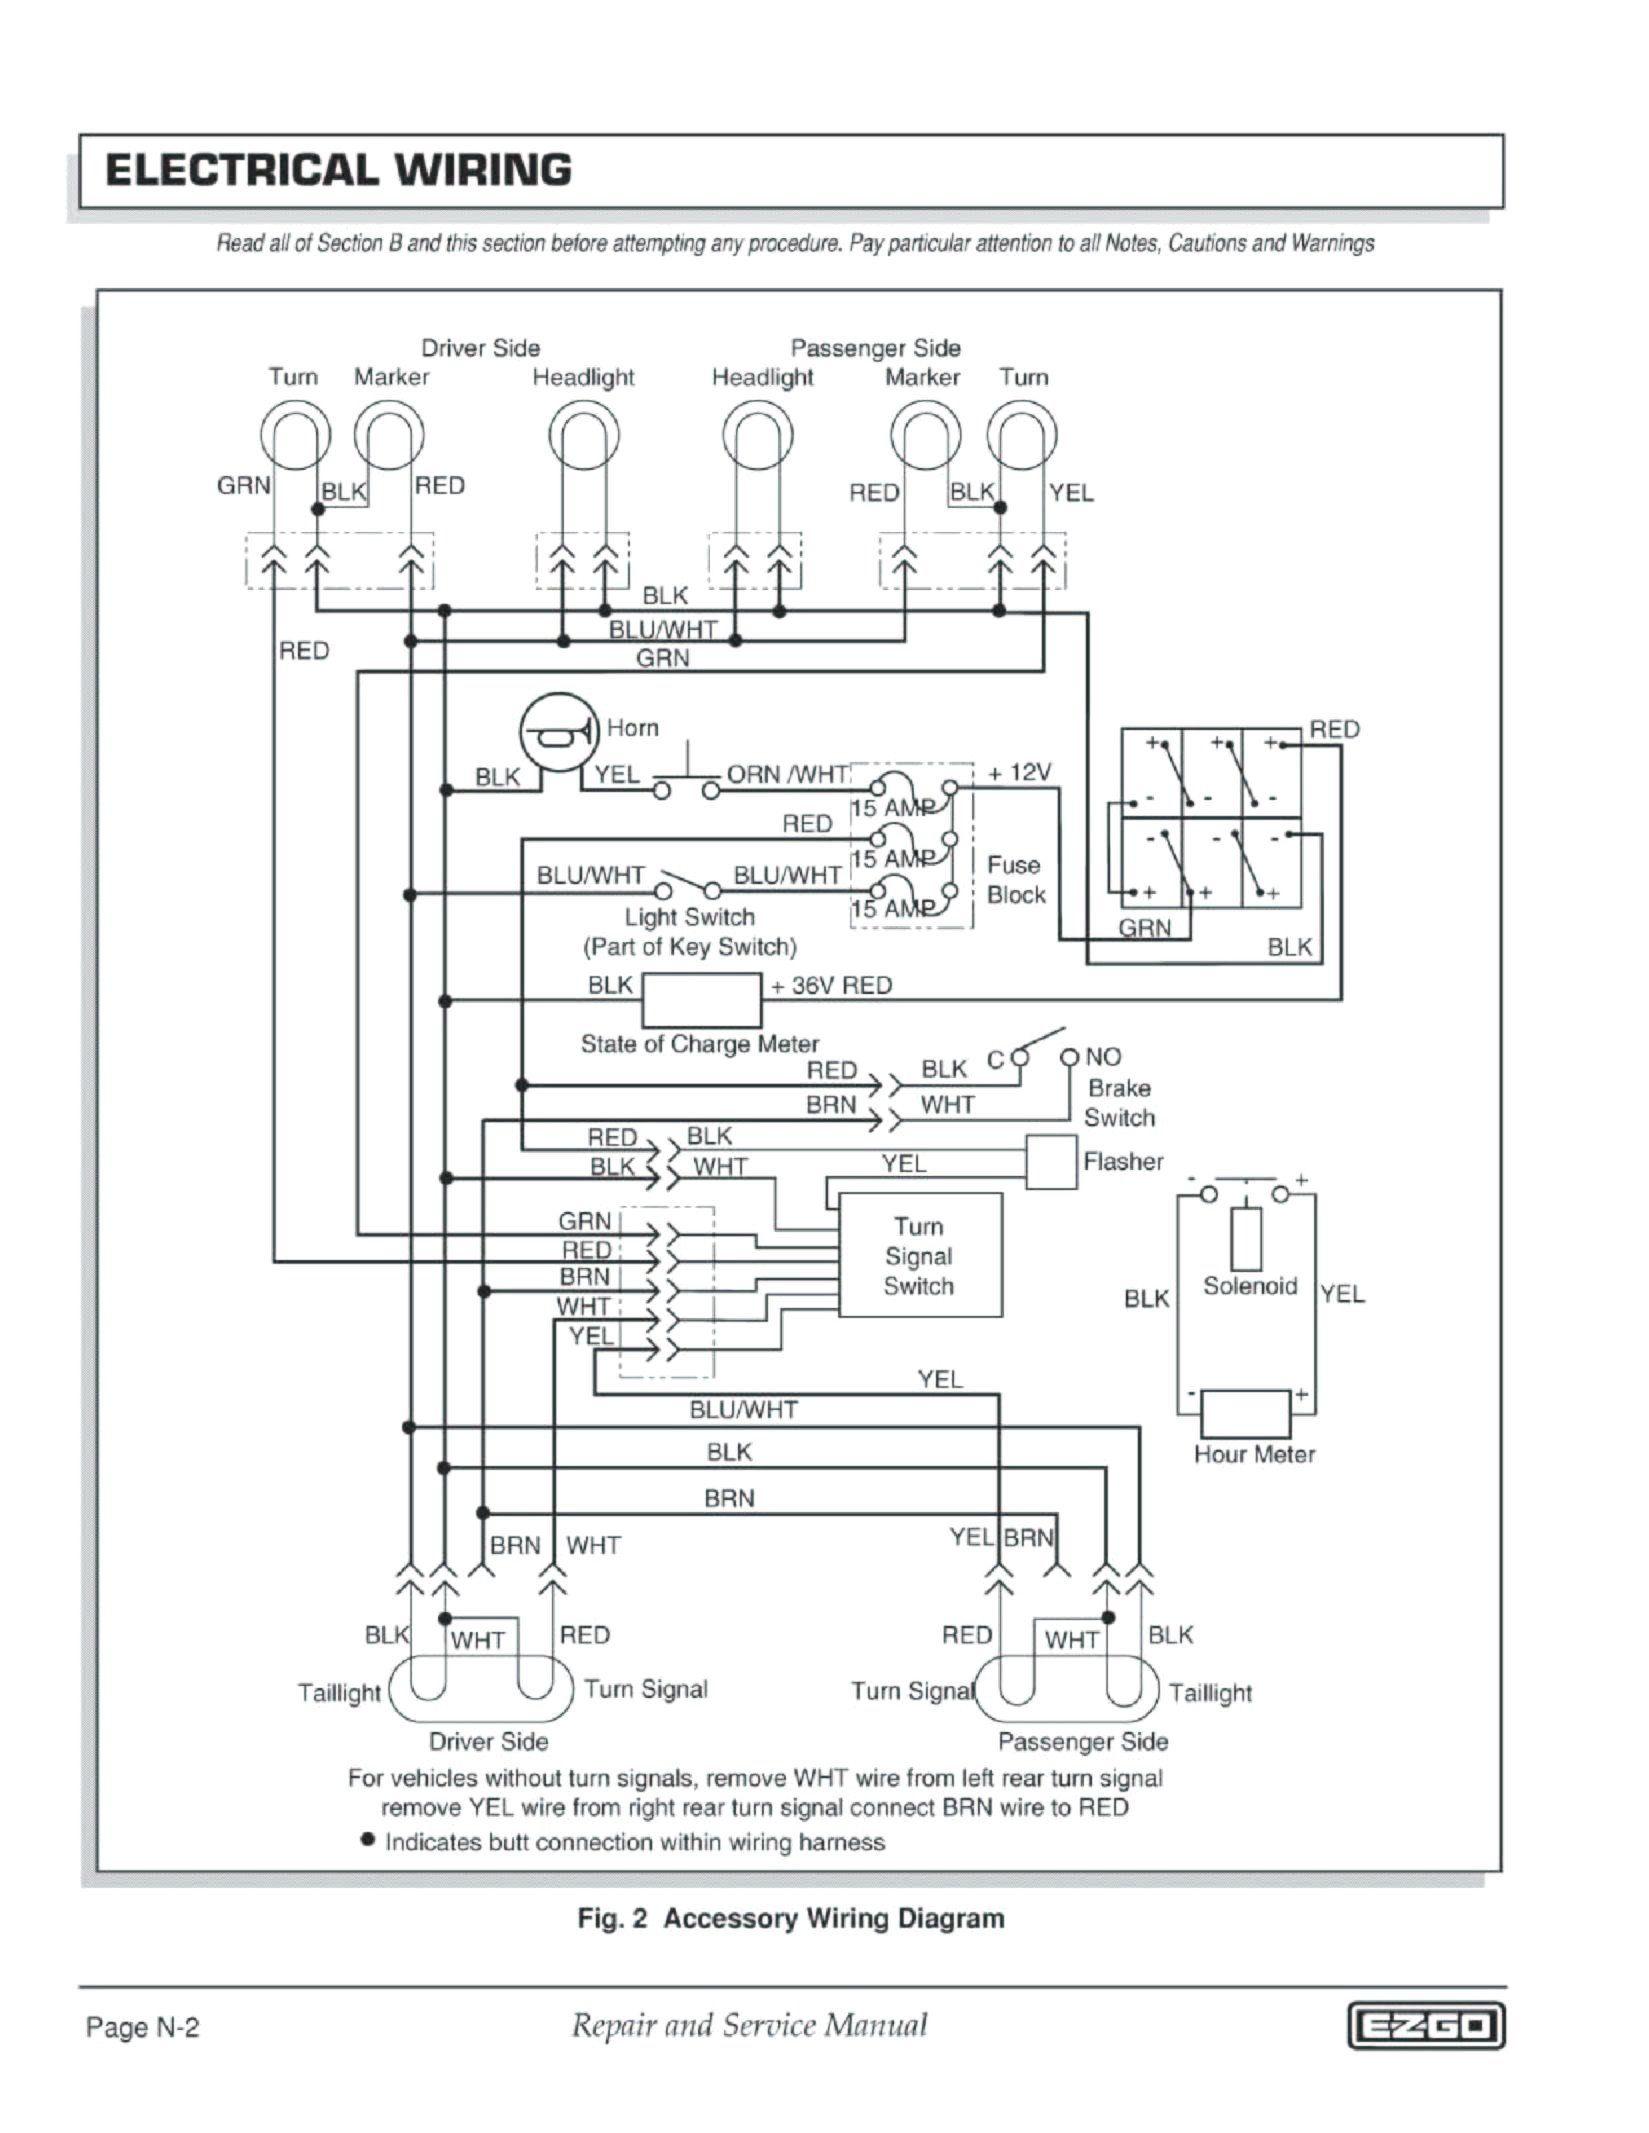 medium resolution of 123 golight wiring diagram acousticguitarguide in excellent 12 volt switch wiring diagram go light wiring diagram